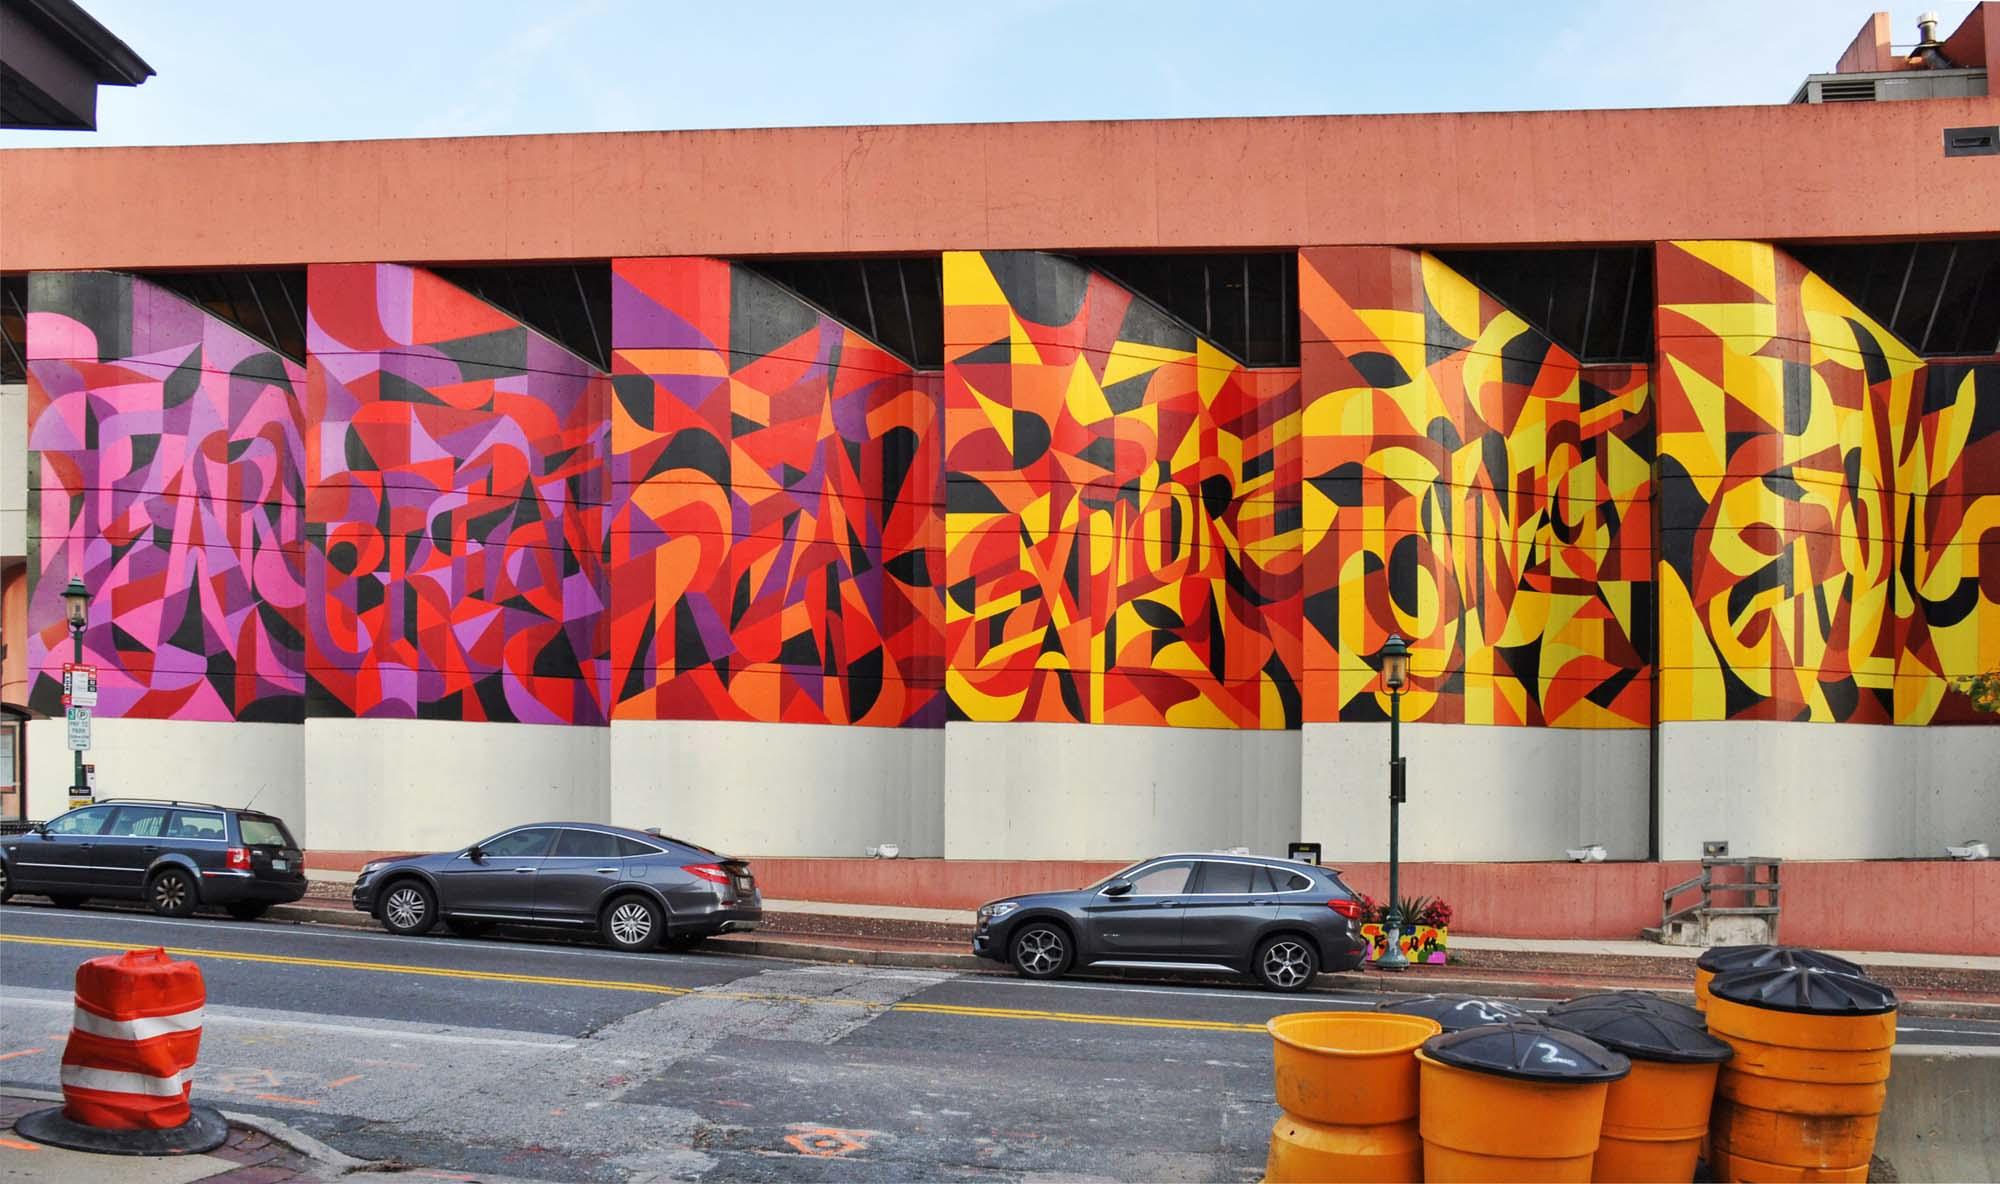 Ryan Adams Public Art Mural in Maryland